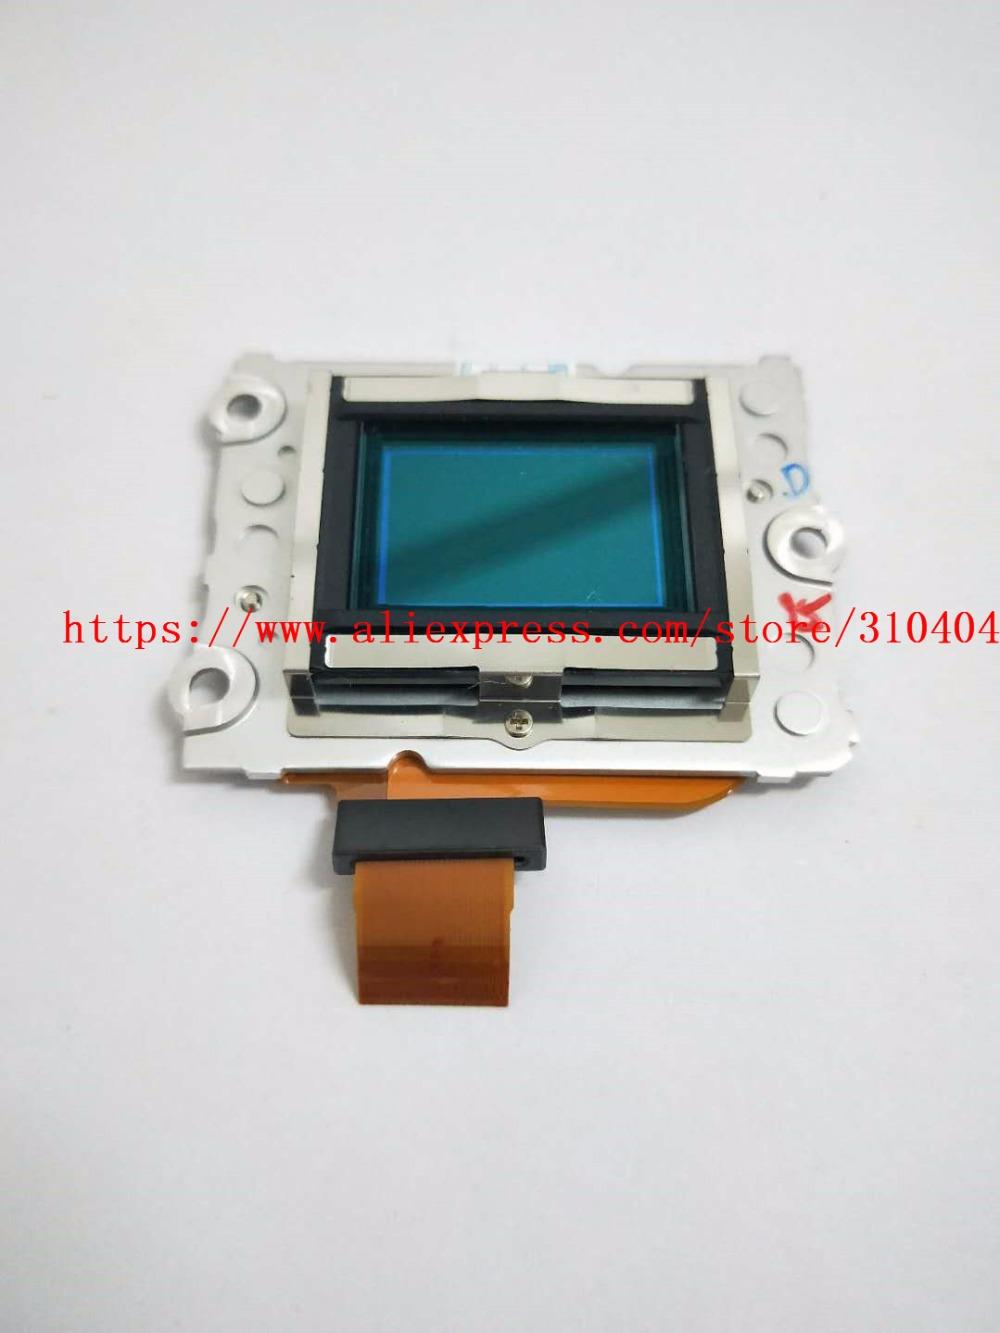 Nikon D7000 Digital SLR Camera Replacement CCD Senor repair Part